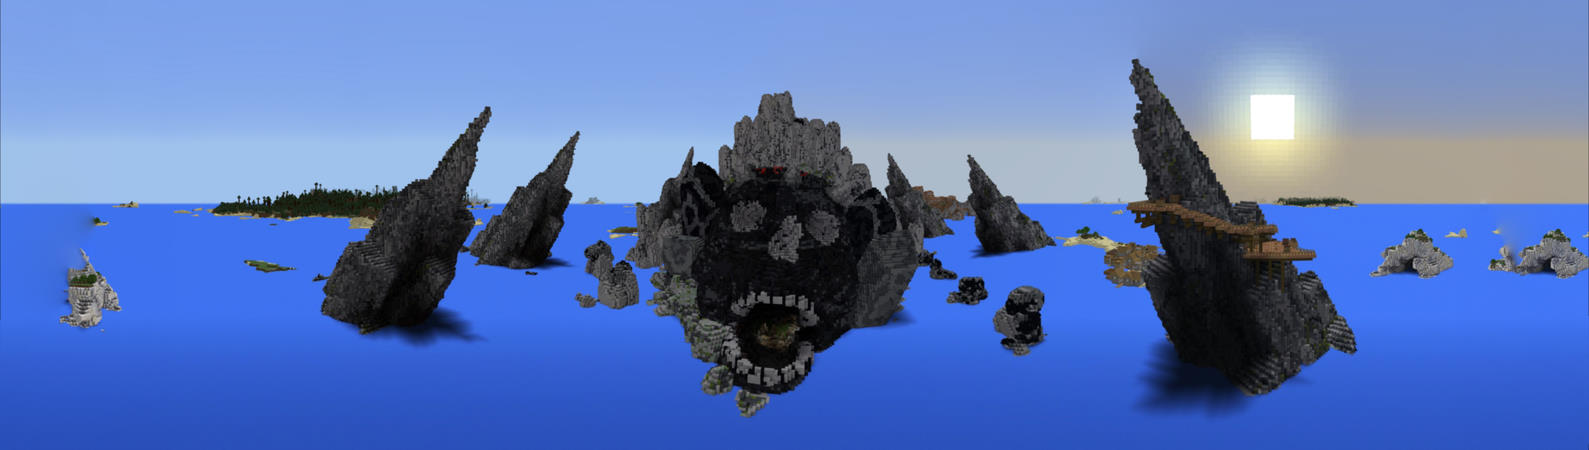 SKULL ISLAND - An epic pirate adventure Minecraft Map